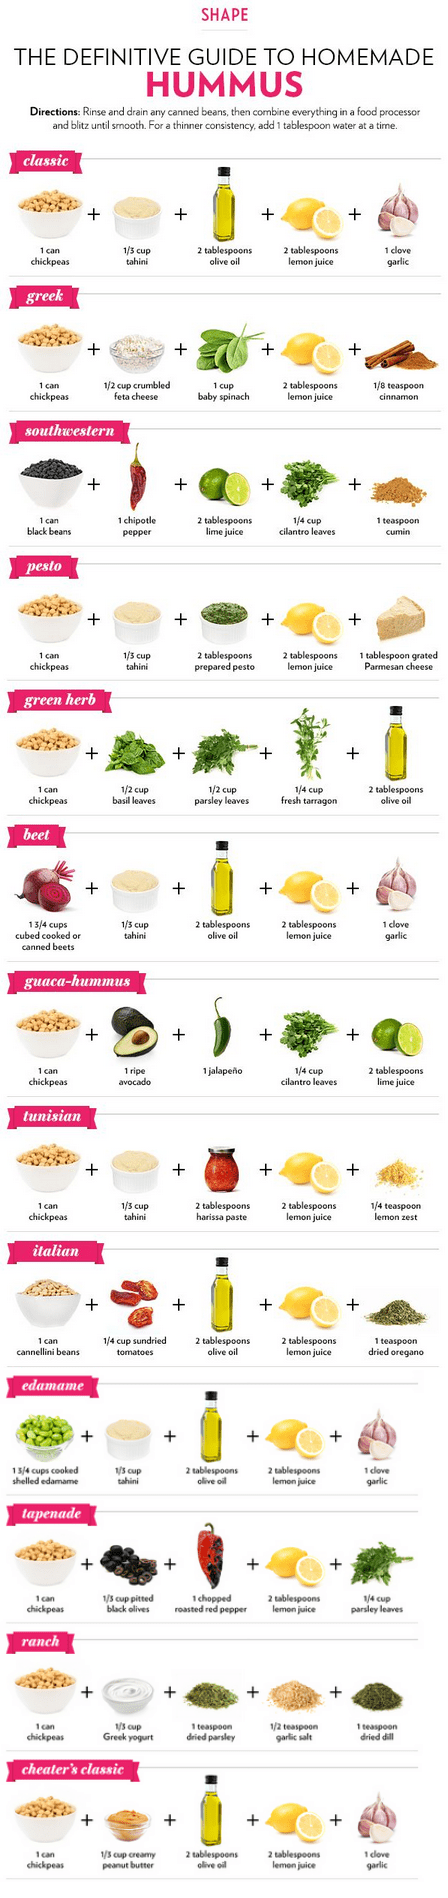 Chart recipe food hummus - 7866596096